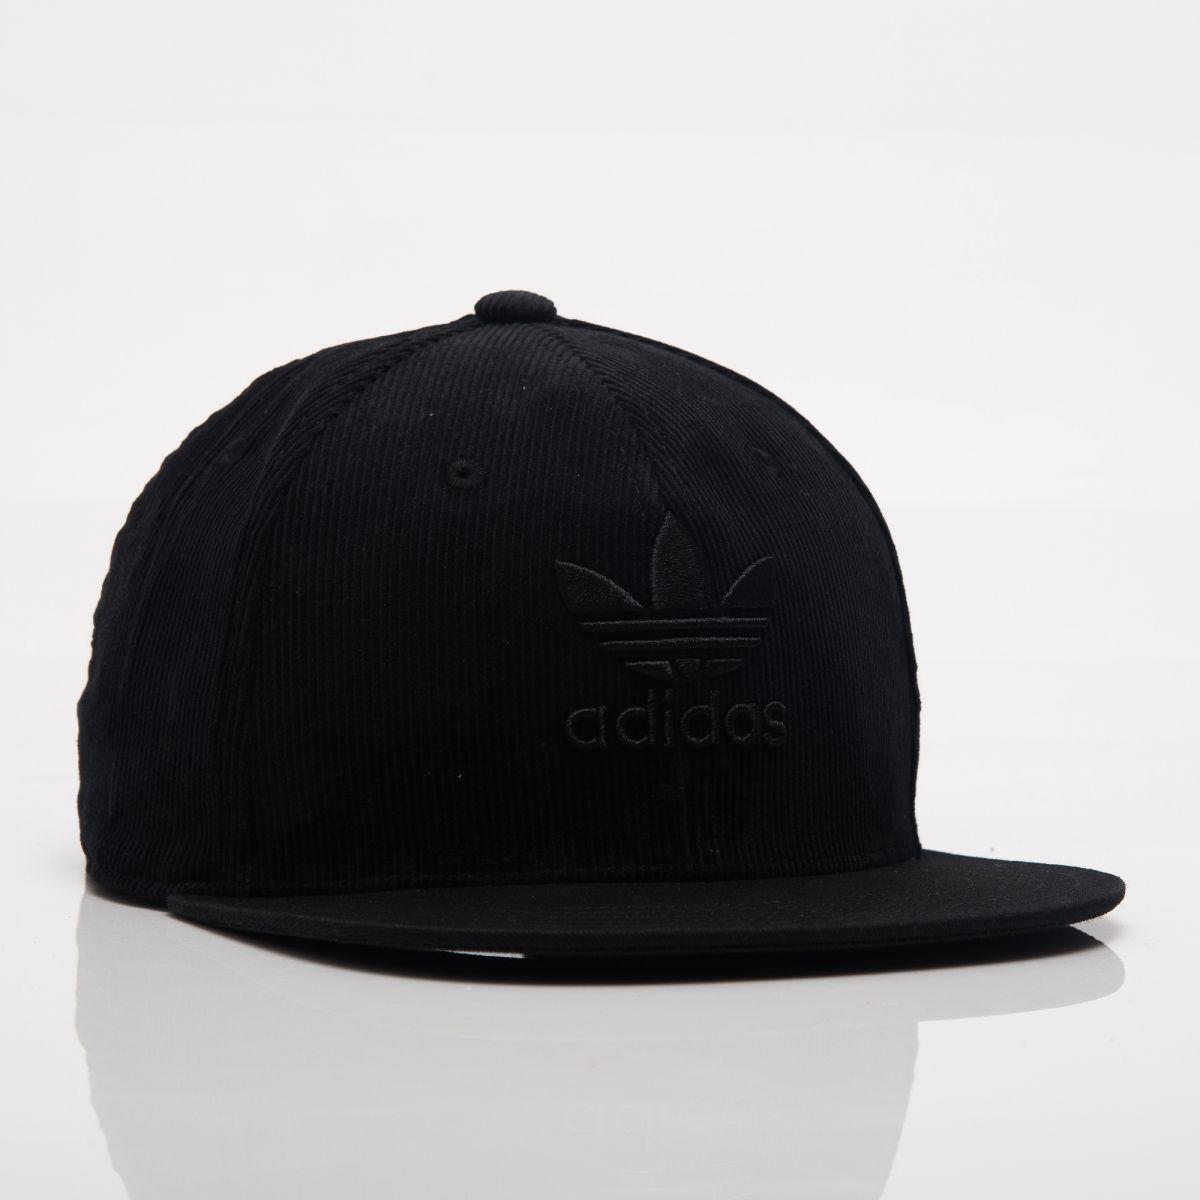 11891b14 ... czech type caps adidas originals trefoil heritage snapback cap 862d6  19d49 ...